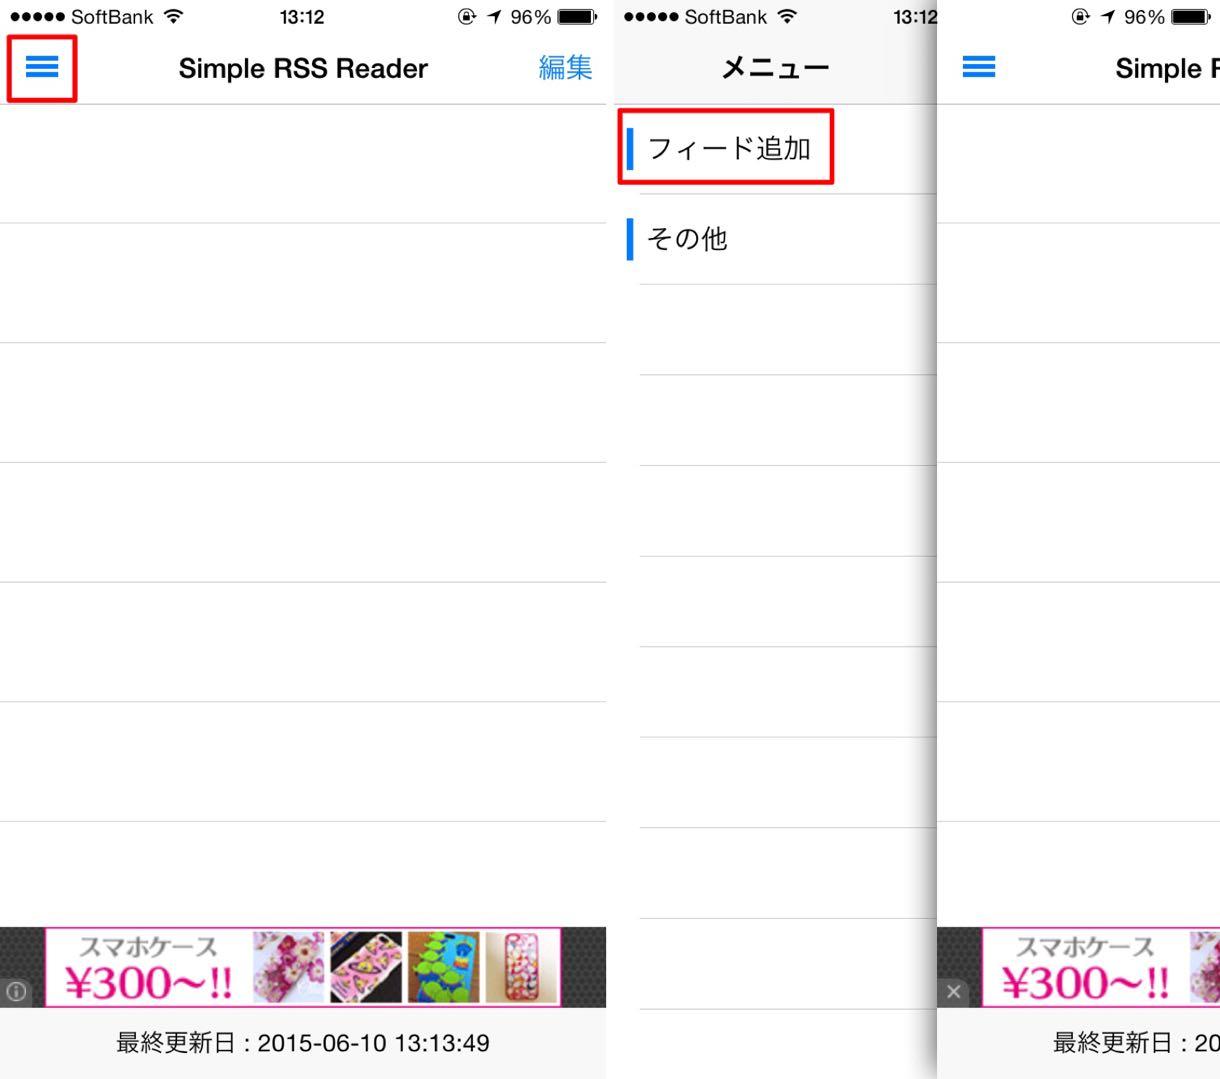 Simple RSS Reader フィード登録